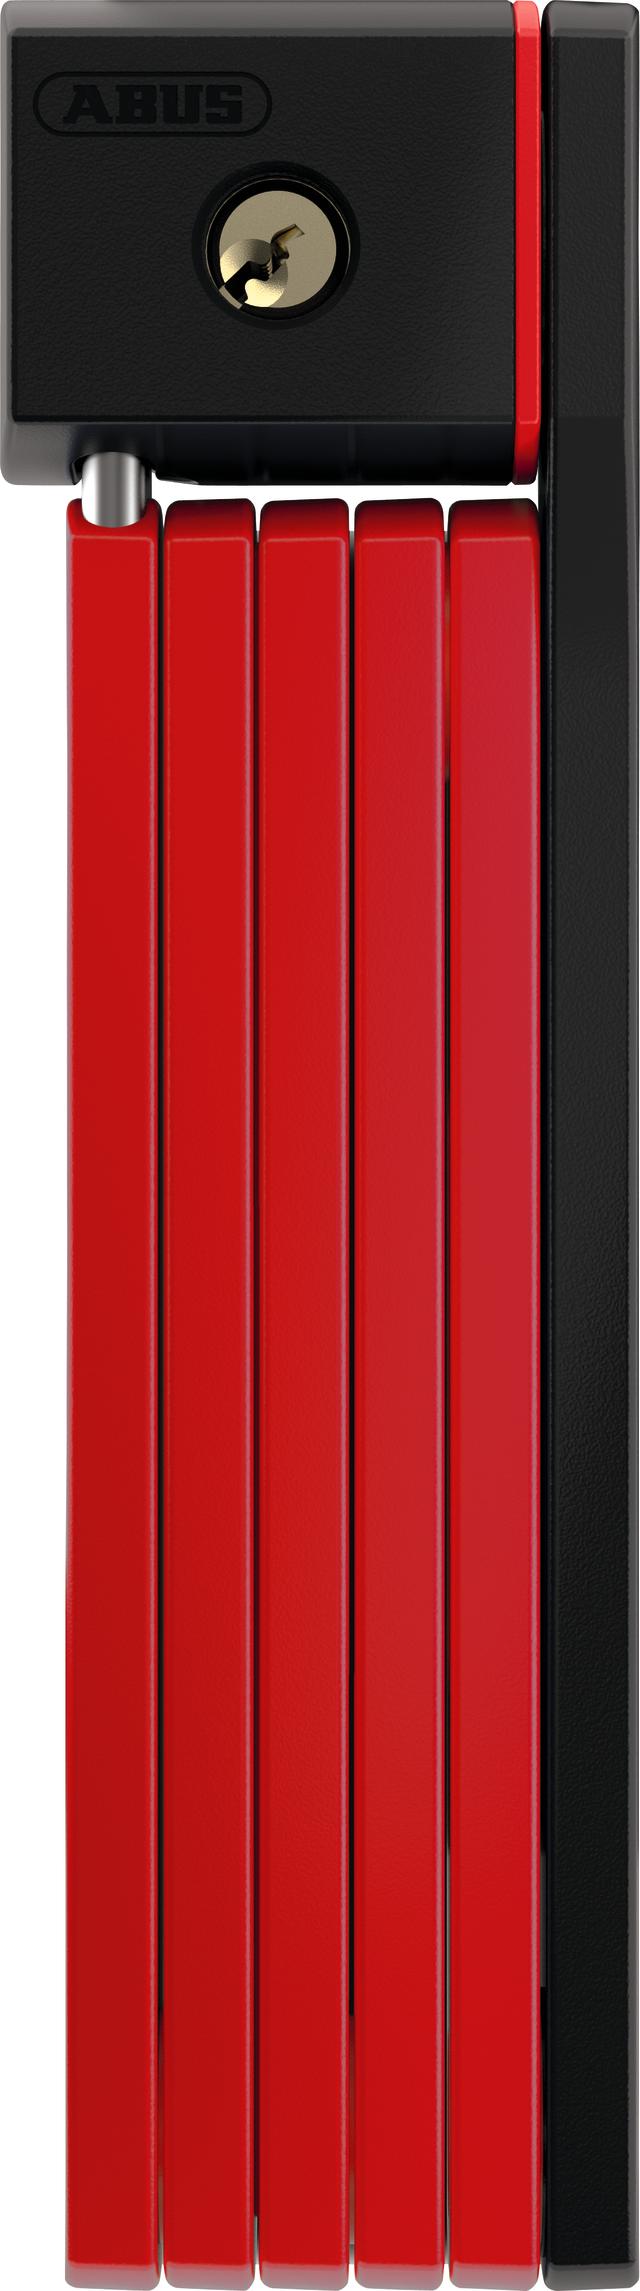 Vikbart lås 5700/80 röd SH